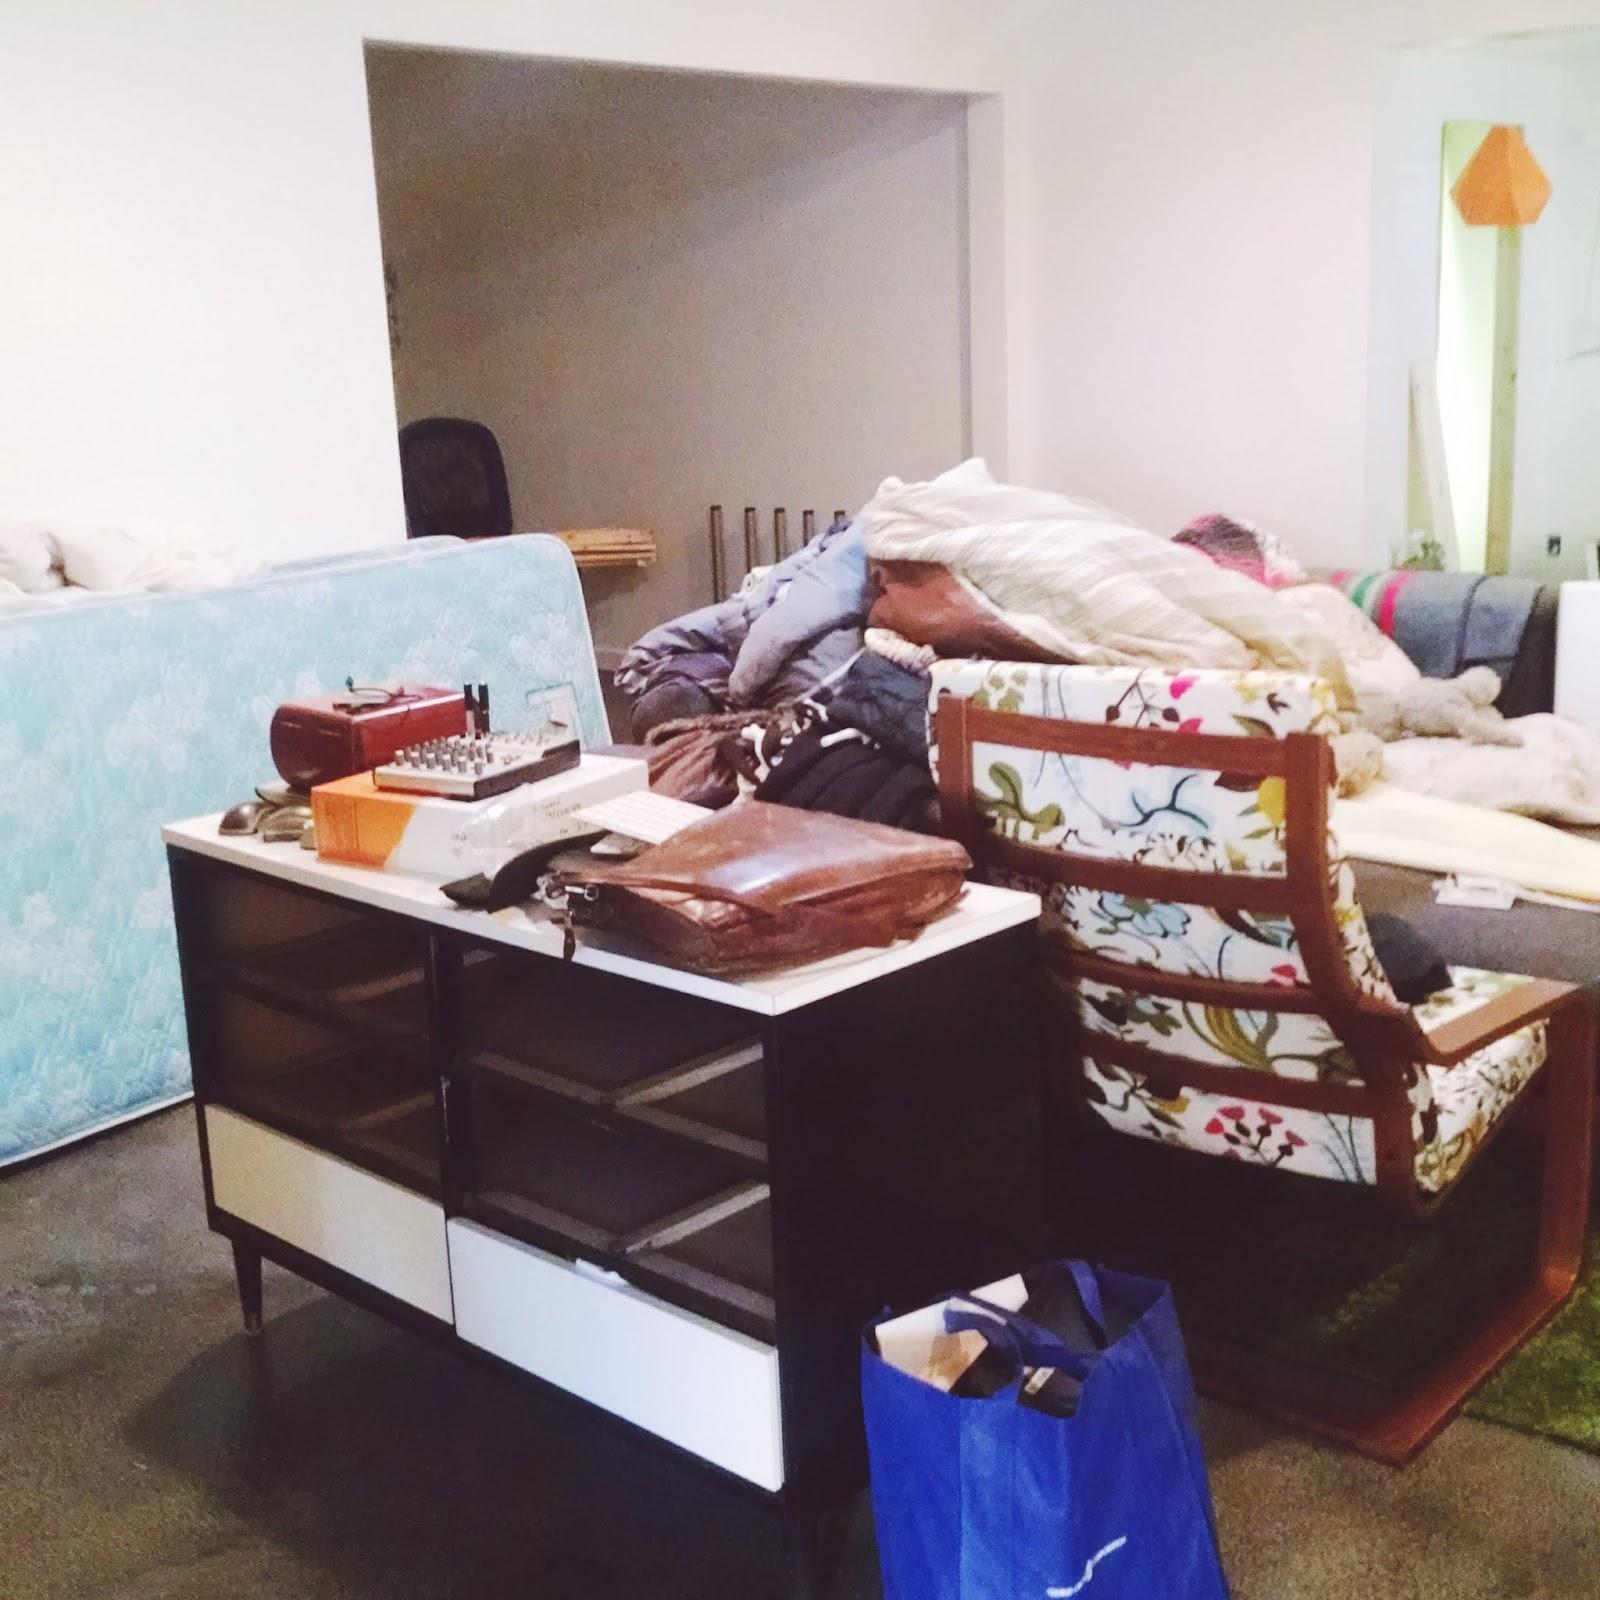 Arizona House - littleladylittlecity.com